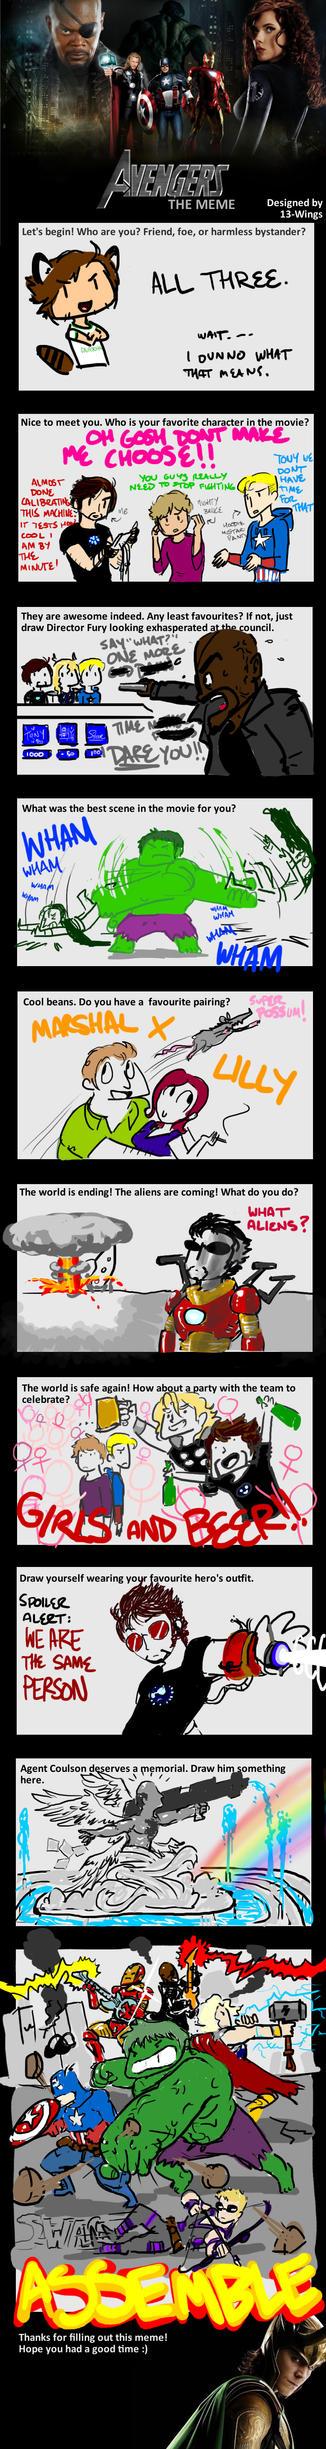 Avengers Meme: SPOILERS by supermanwich23